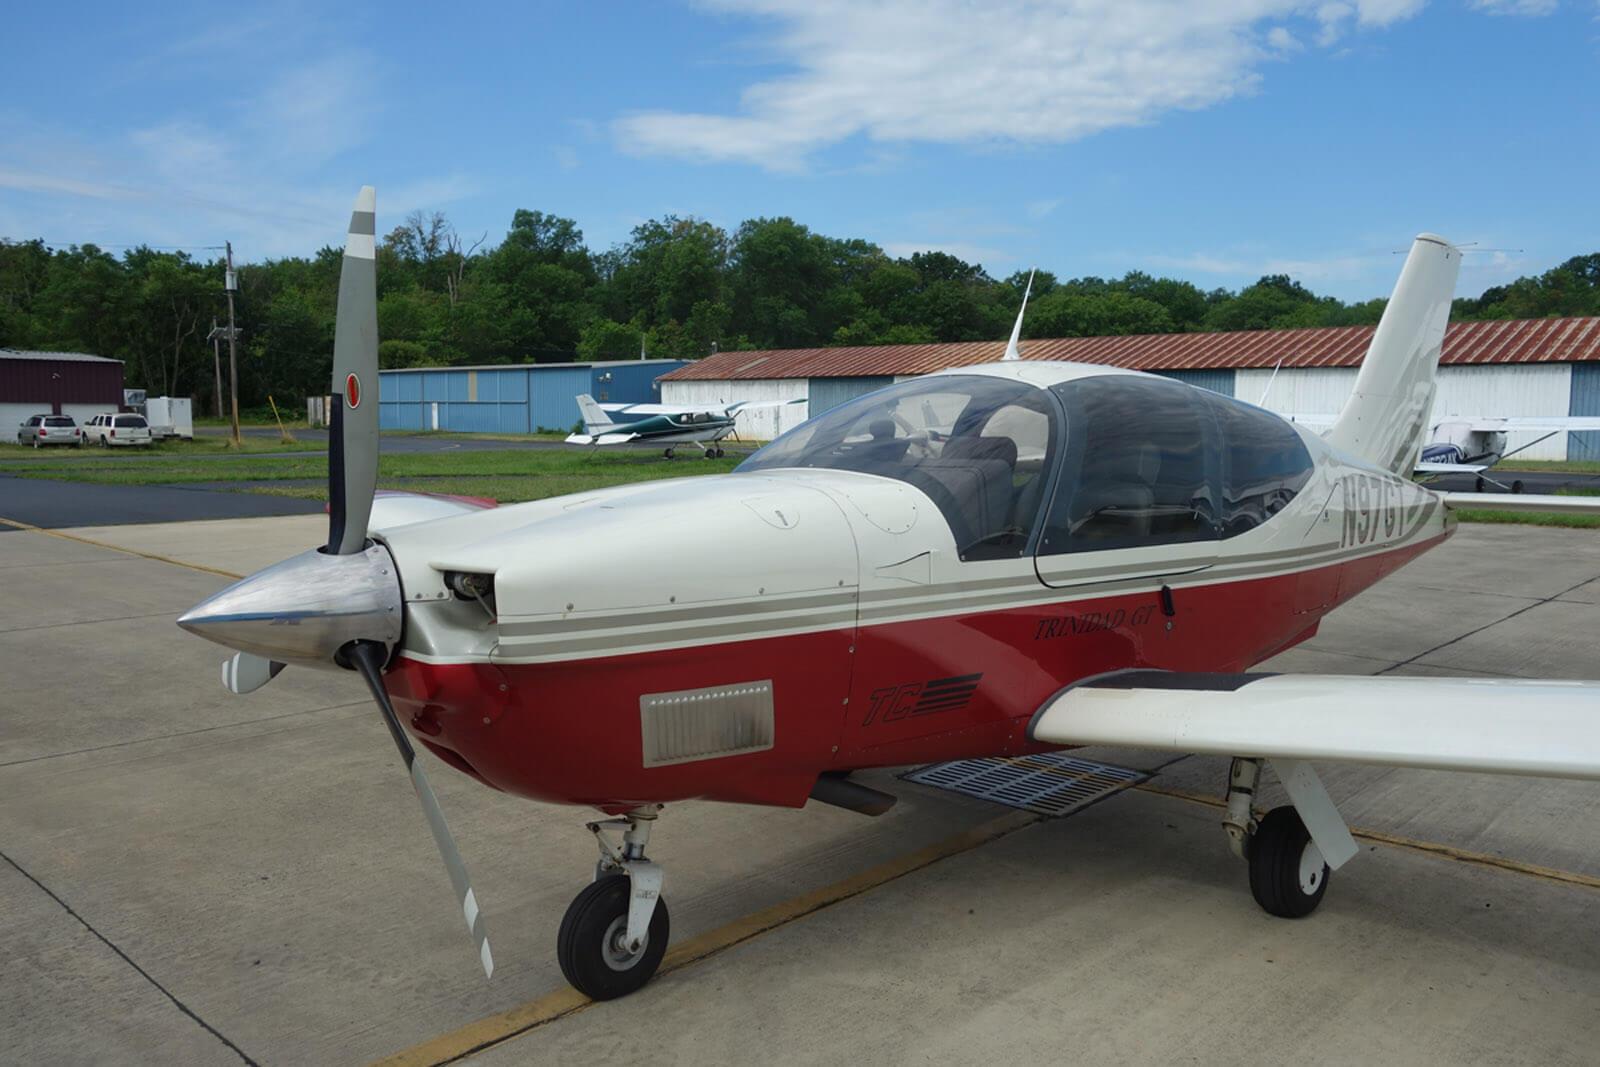 2002 Socata TB21Turbo FOR SALE at Princeton Airport